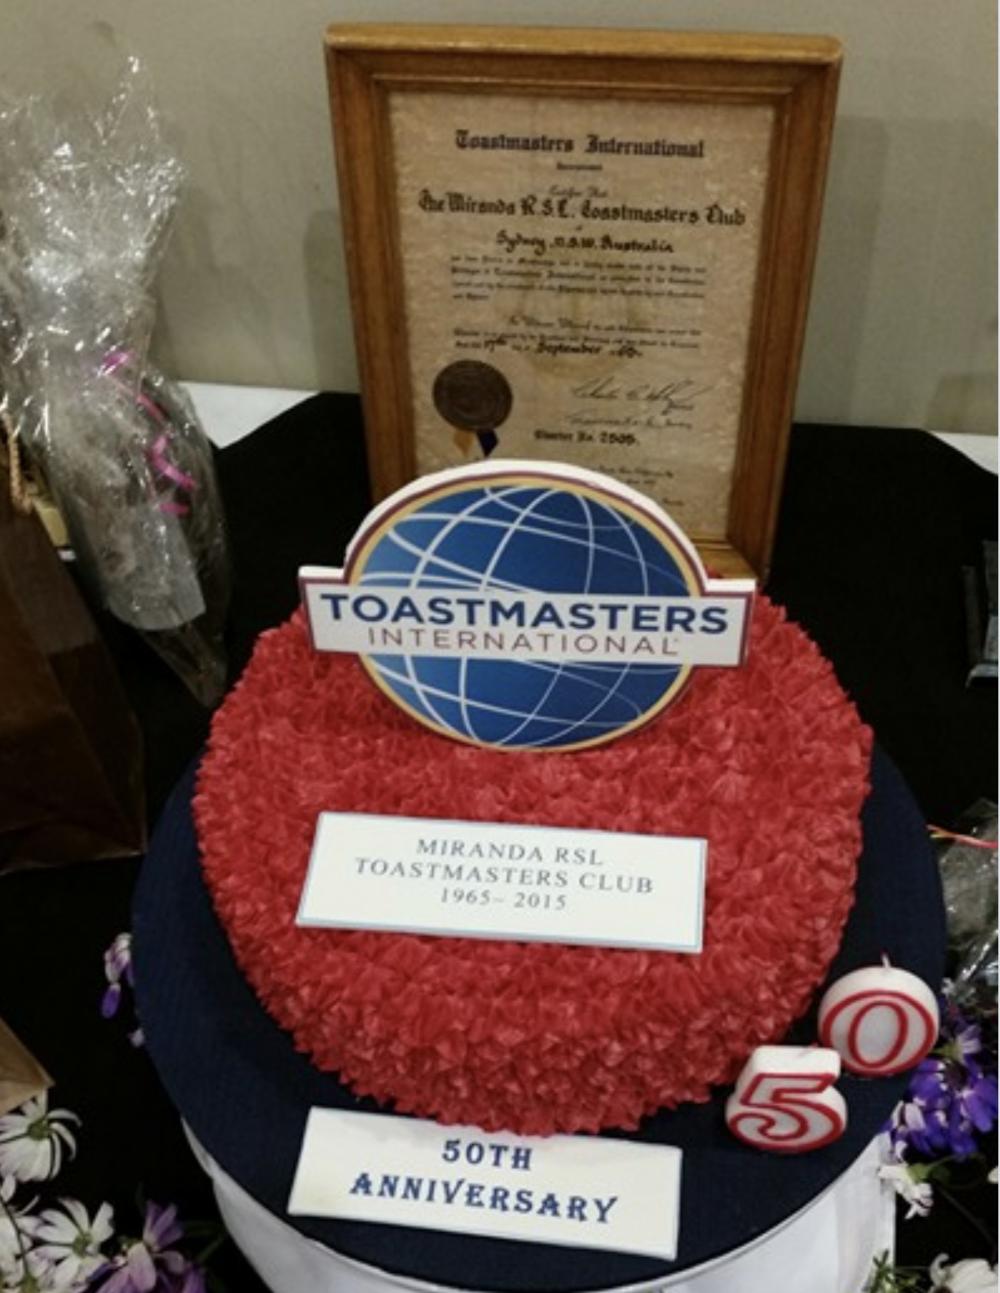 Miranda RSL Toastmasters 50th Anniversary - September 2015